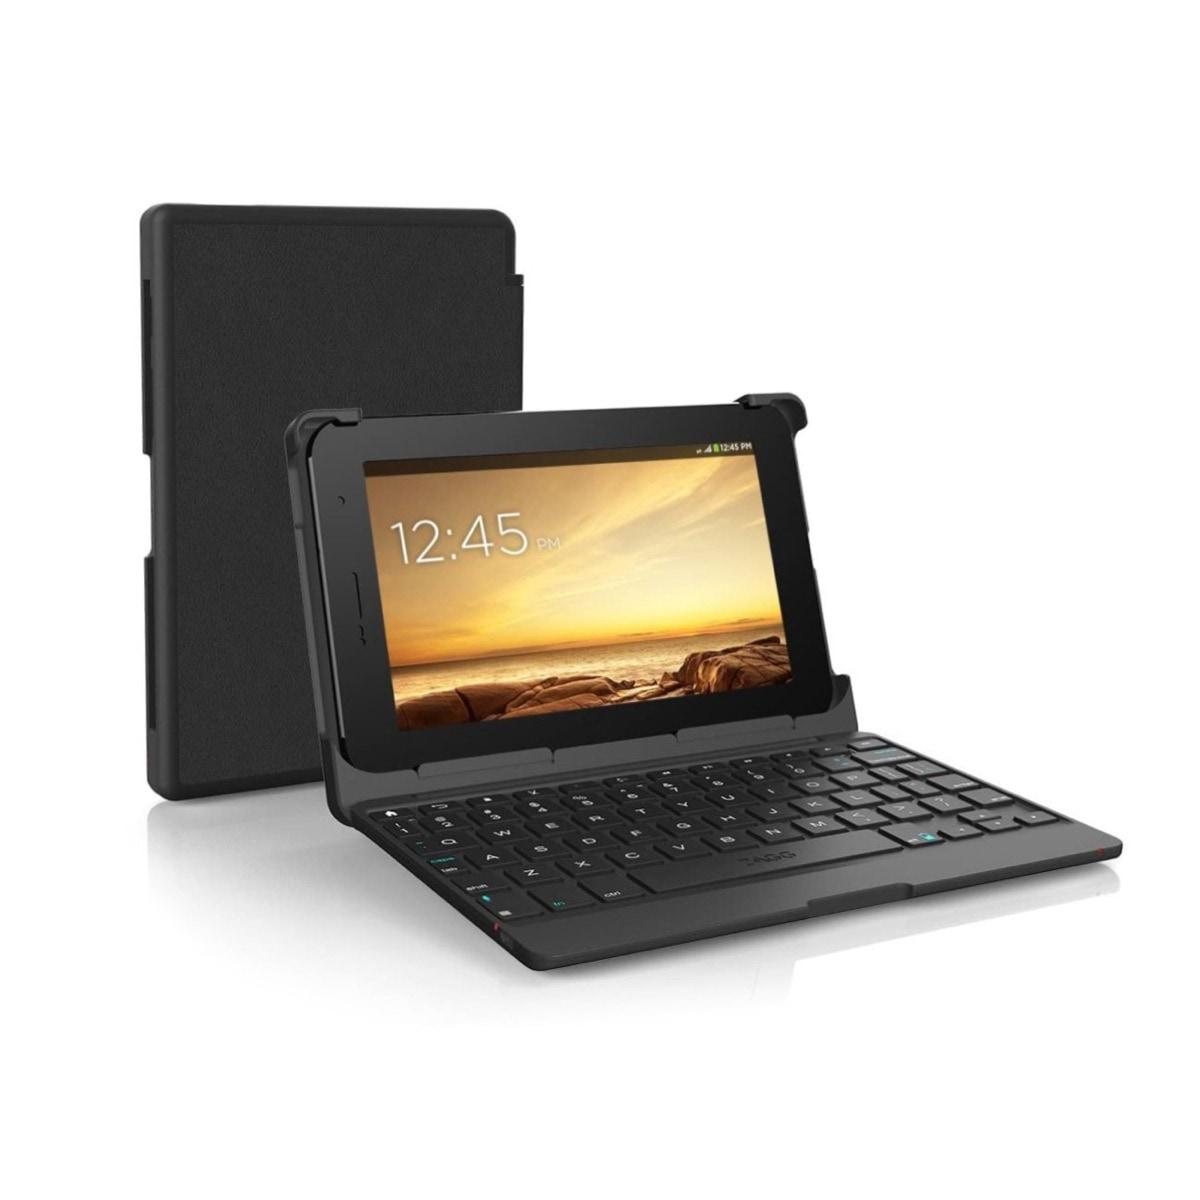 Spring-loaded folio keyboard case for Amazon Fire 7